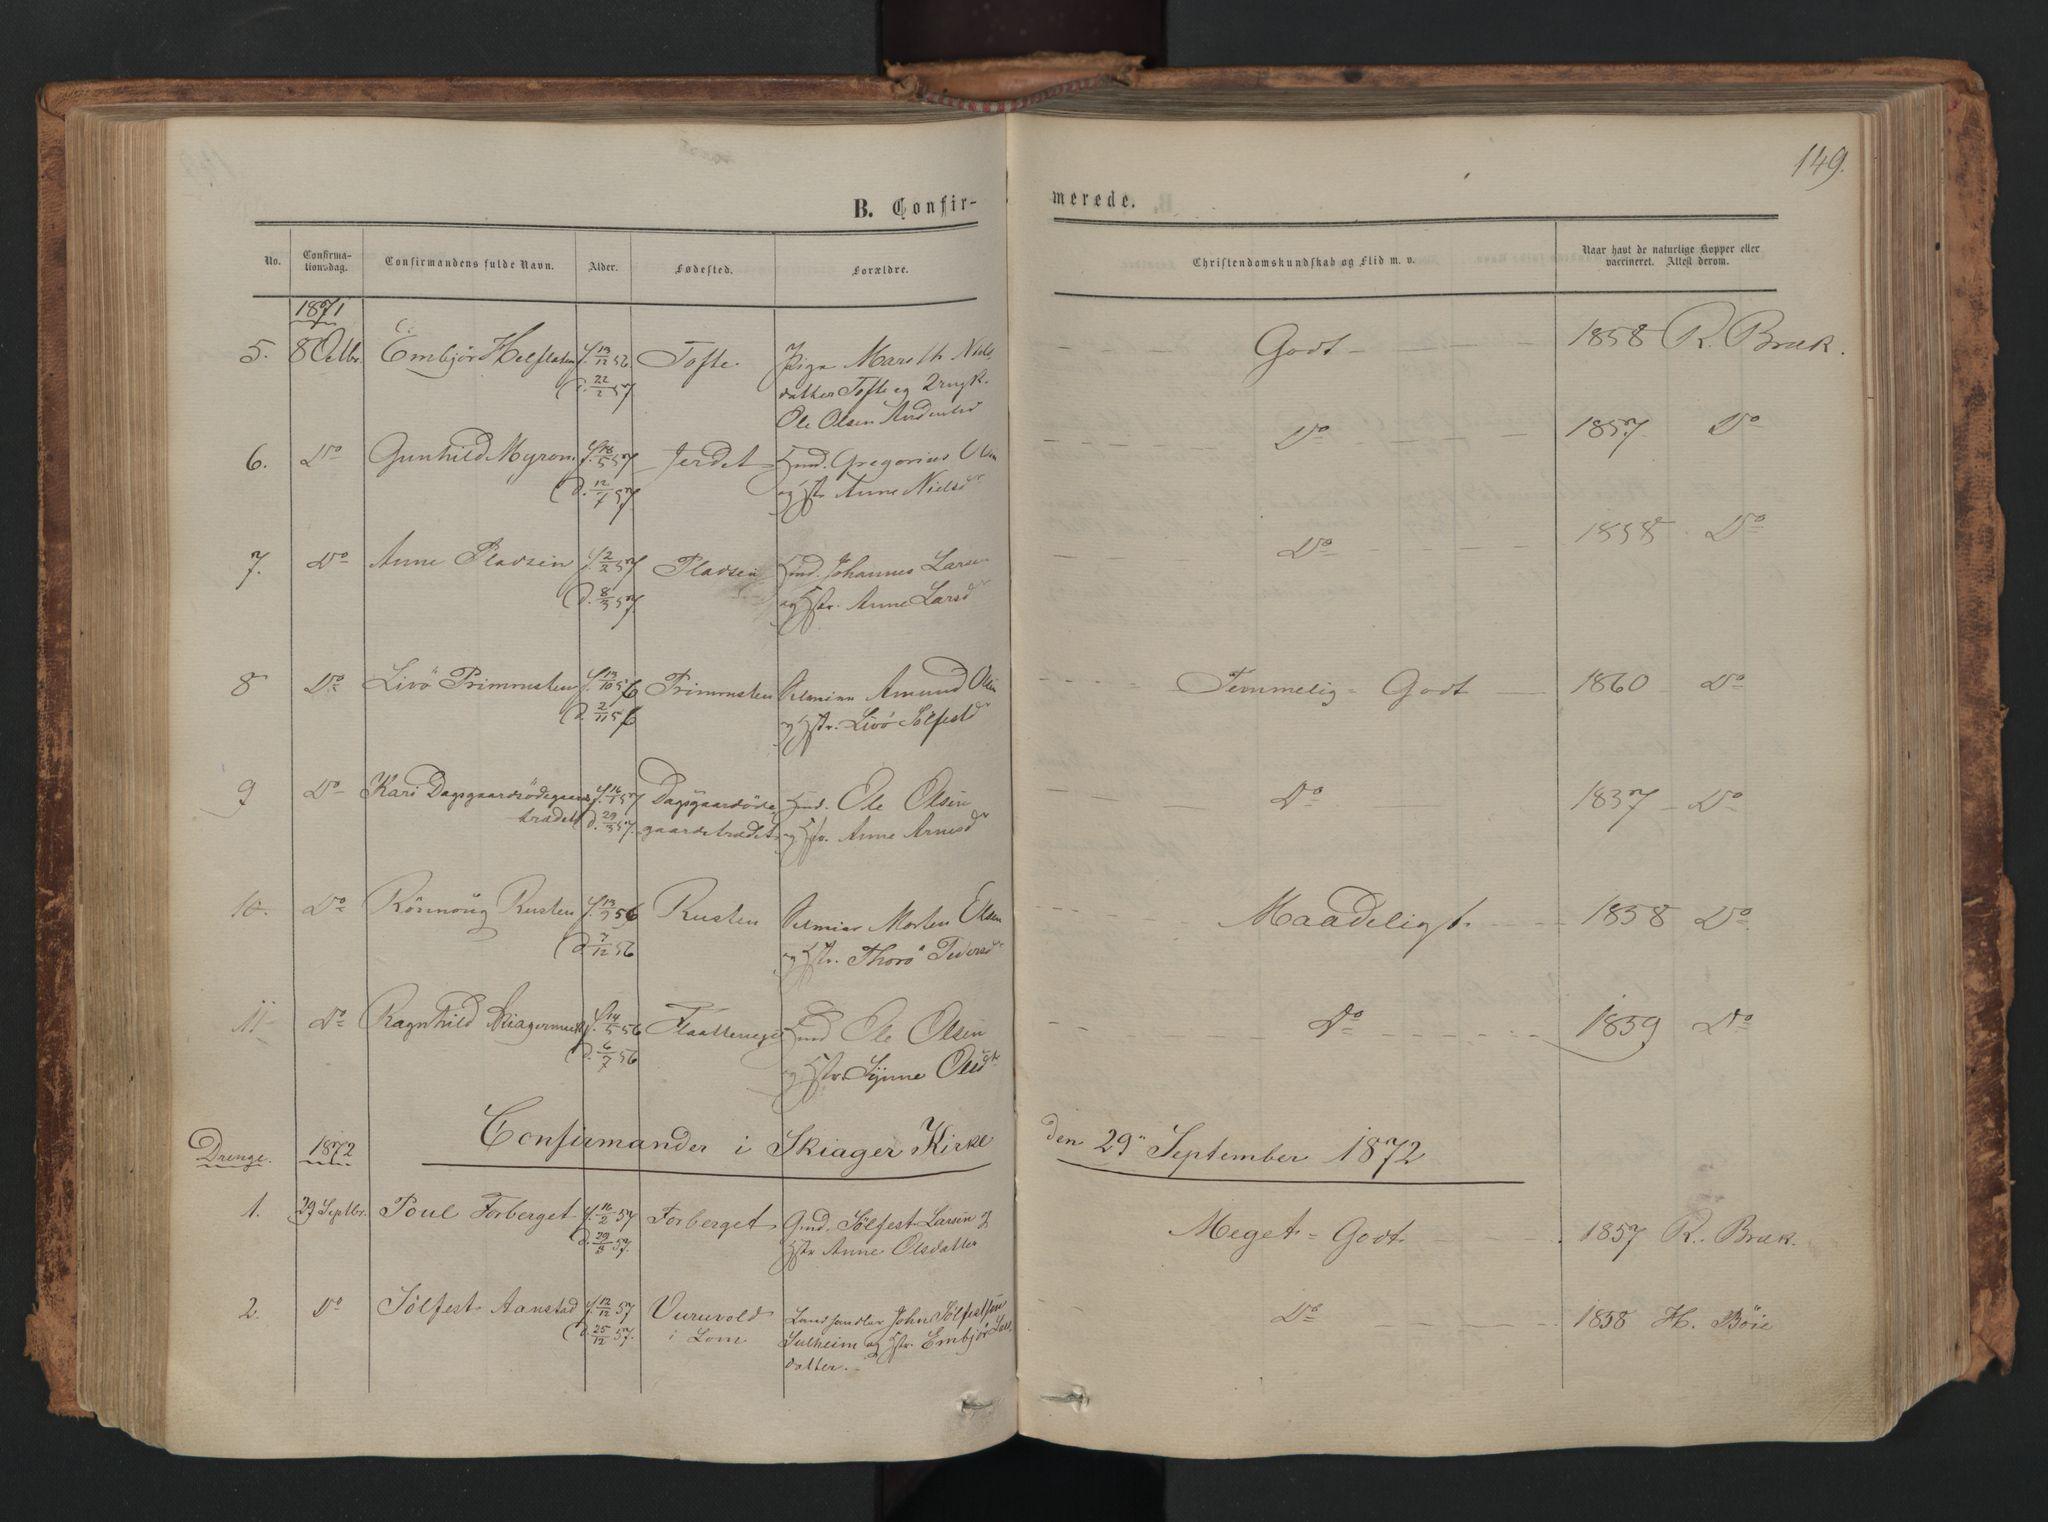 SAH, Skjåk prestekontor, Ministerialbok nr. 1, 1863-1879, s. 149